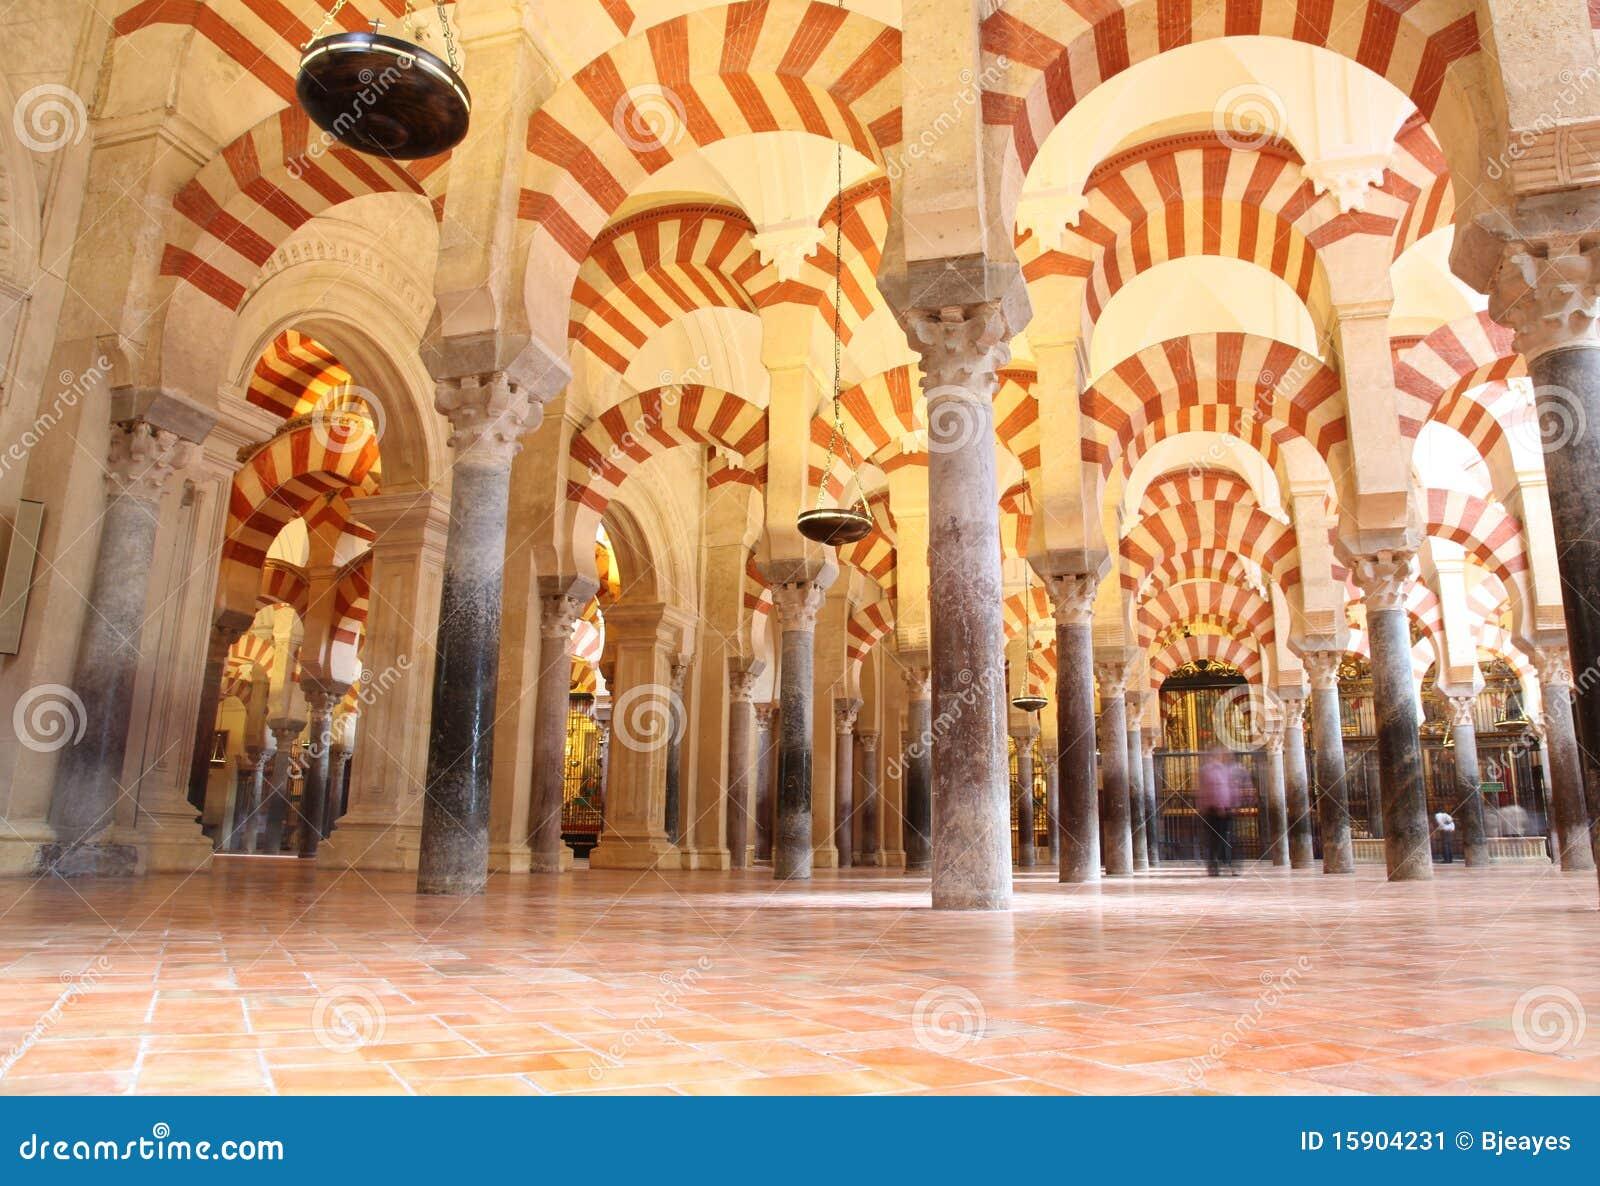 Mezquita - Cordoba Spain